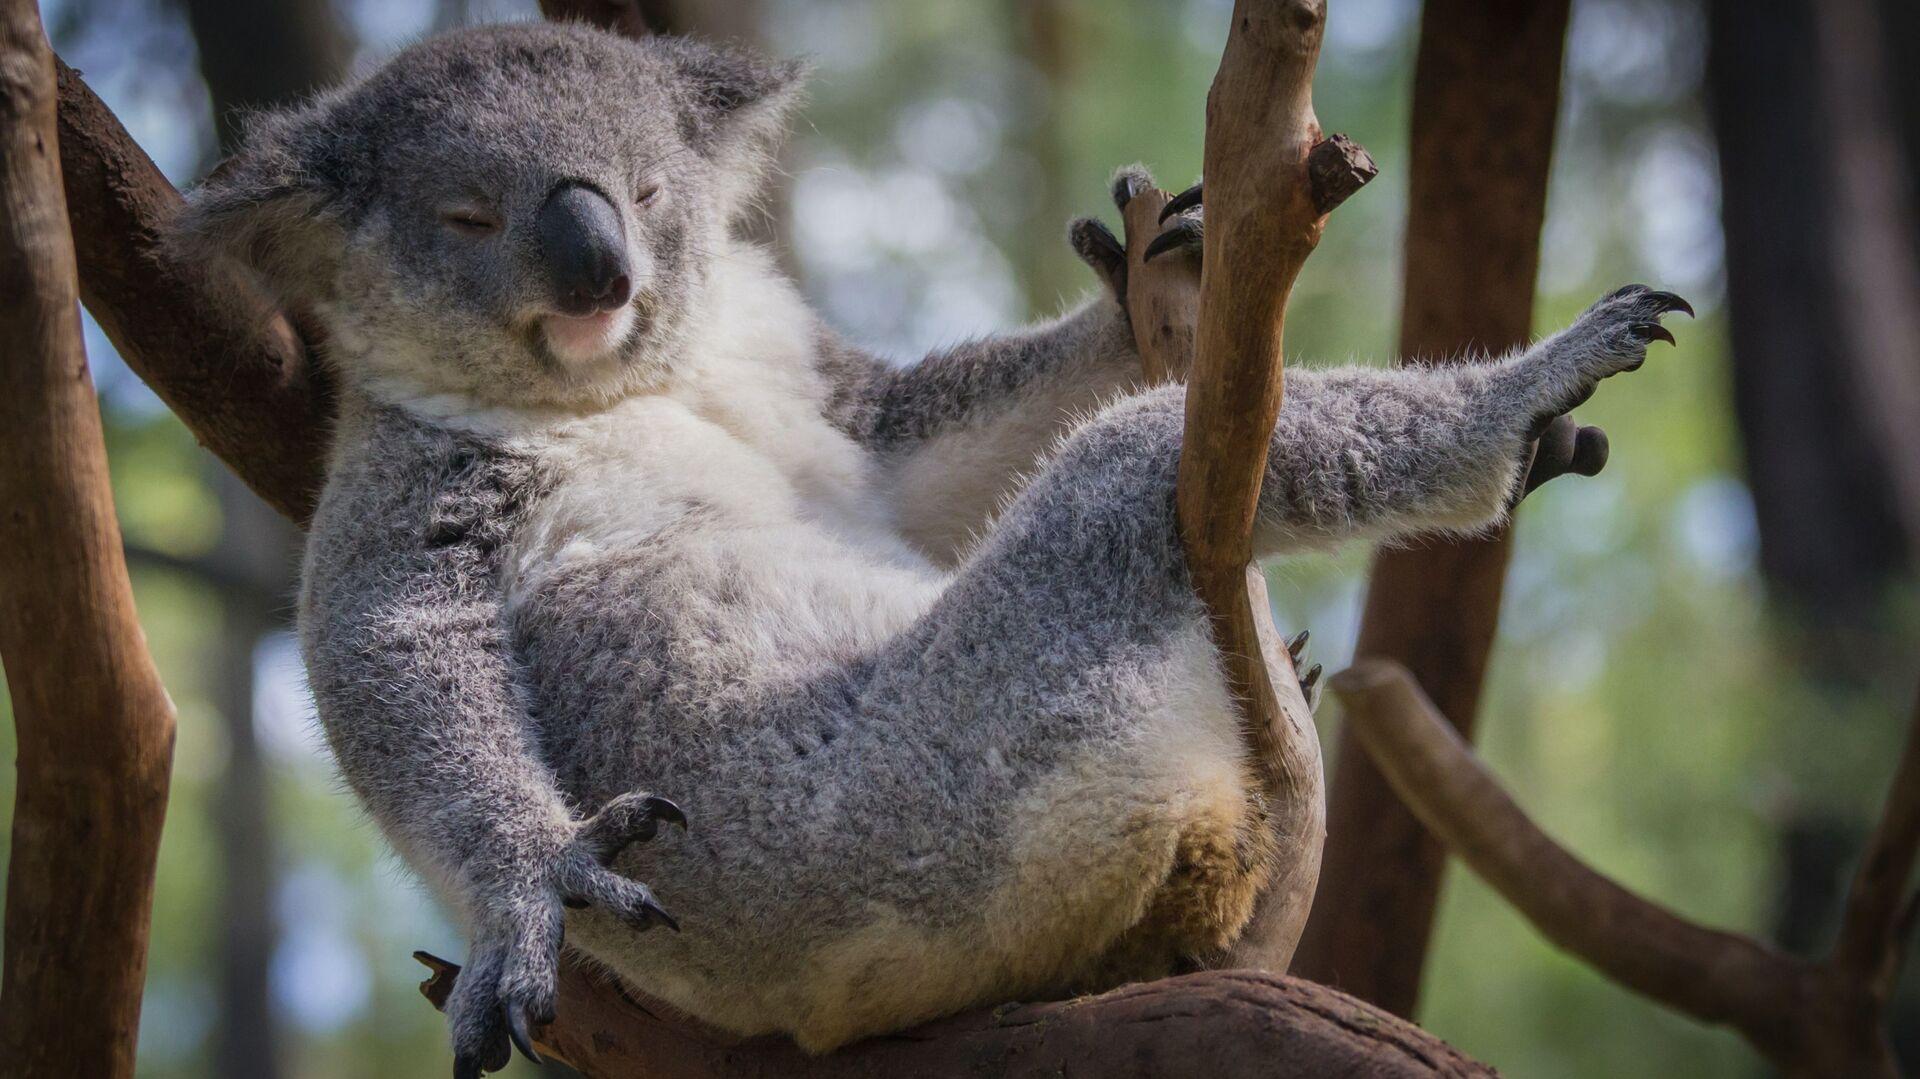 Los koalas pueden desaparecer - Sputnik Mundo, 1920, 23.09.2021